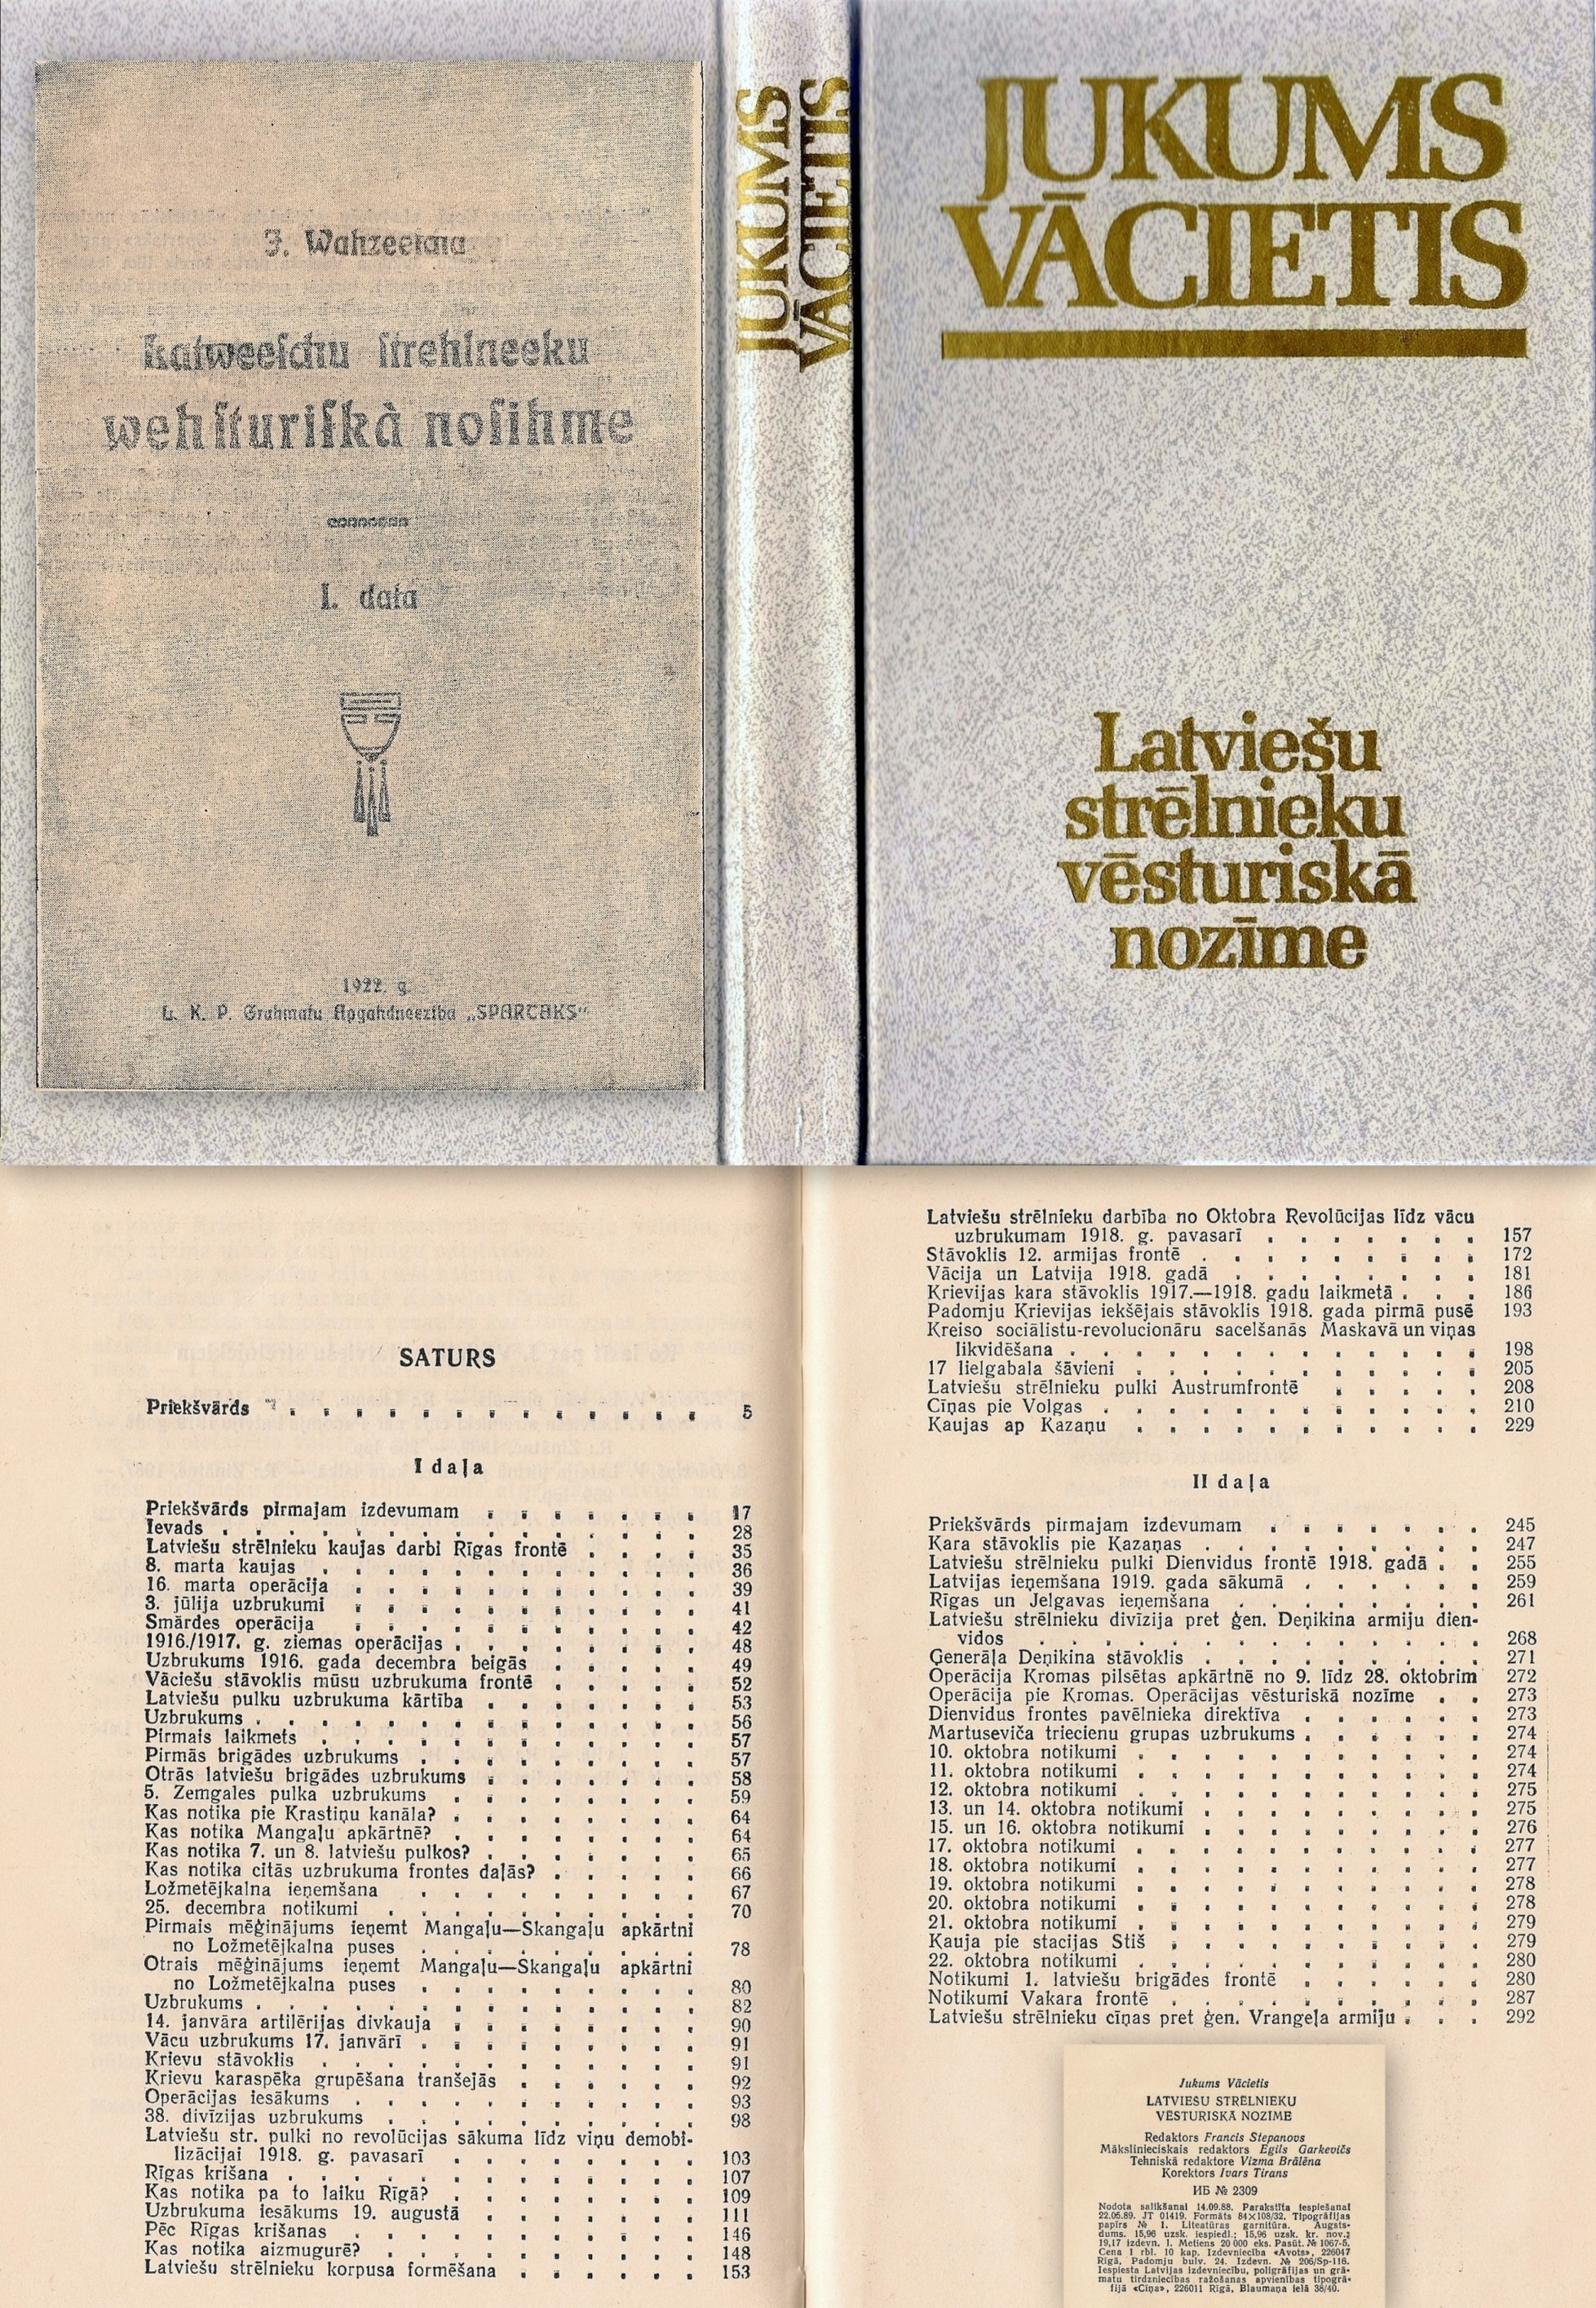 Jukums Vacietis - LSVN-collage=